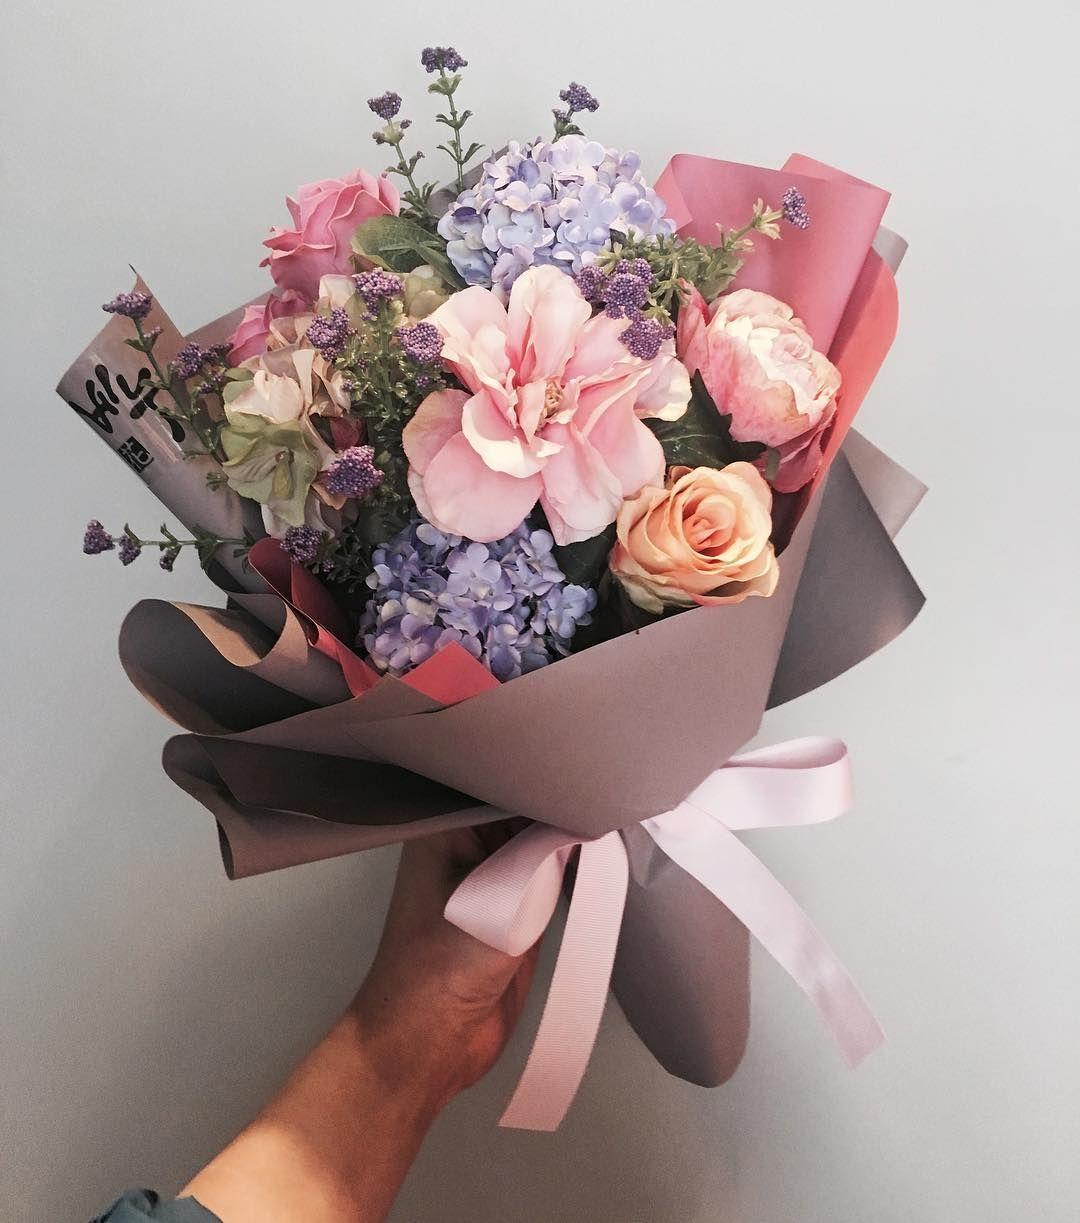 pinterest m e g a n flowers pinterest flowers